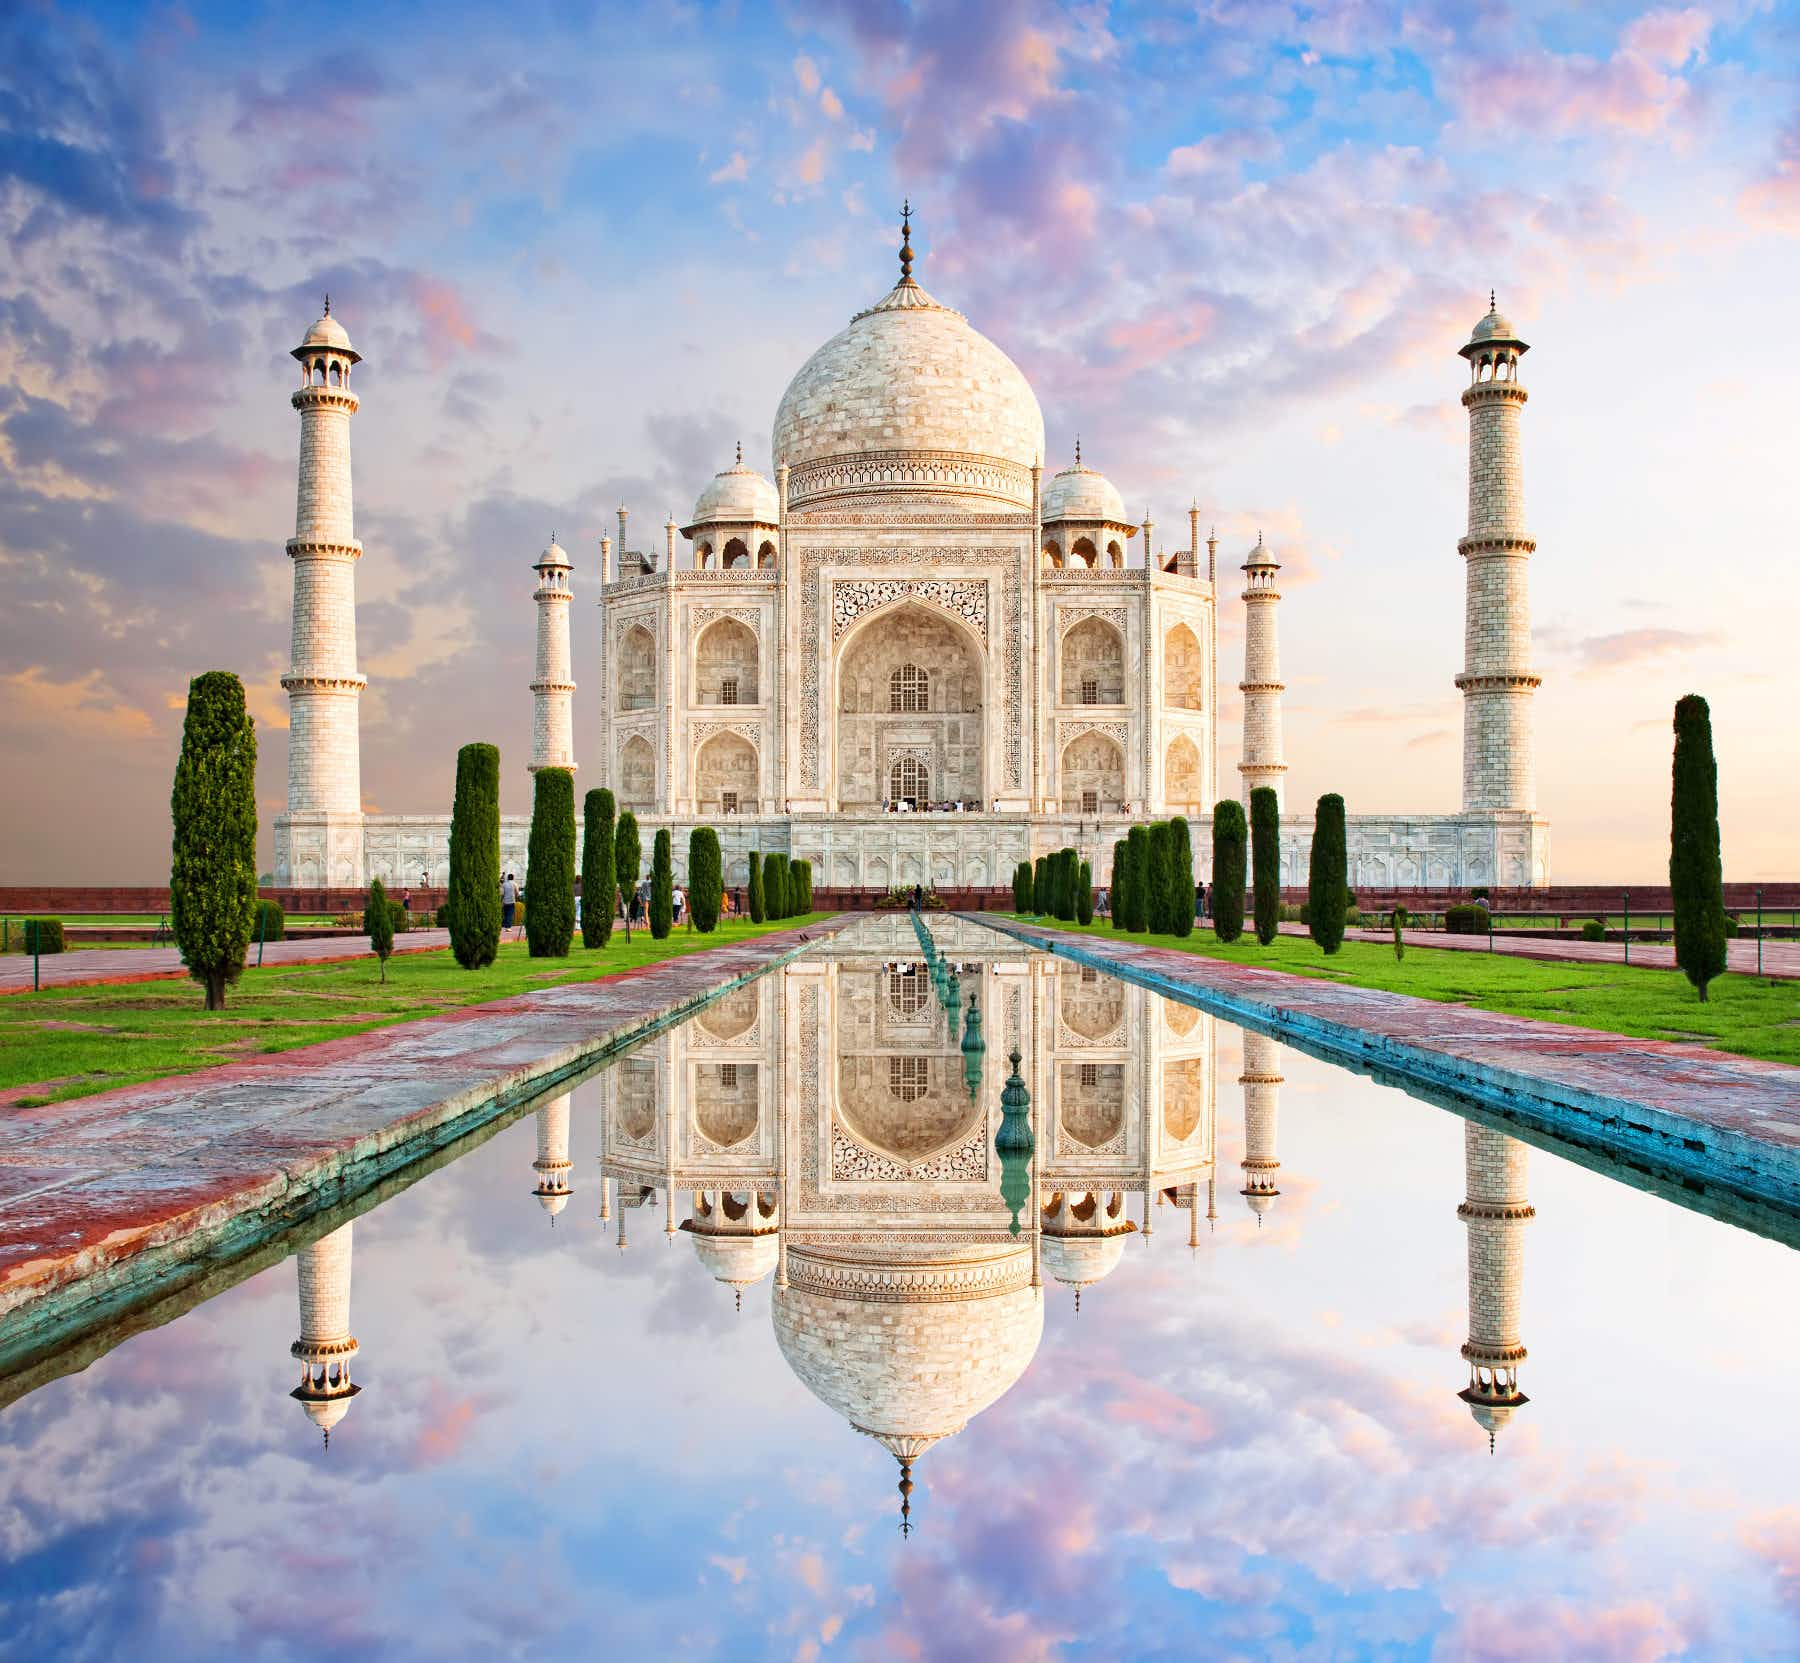 Taj Mahal may limit visitors to protect India's top monument